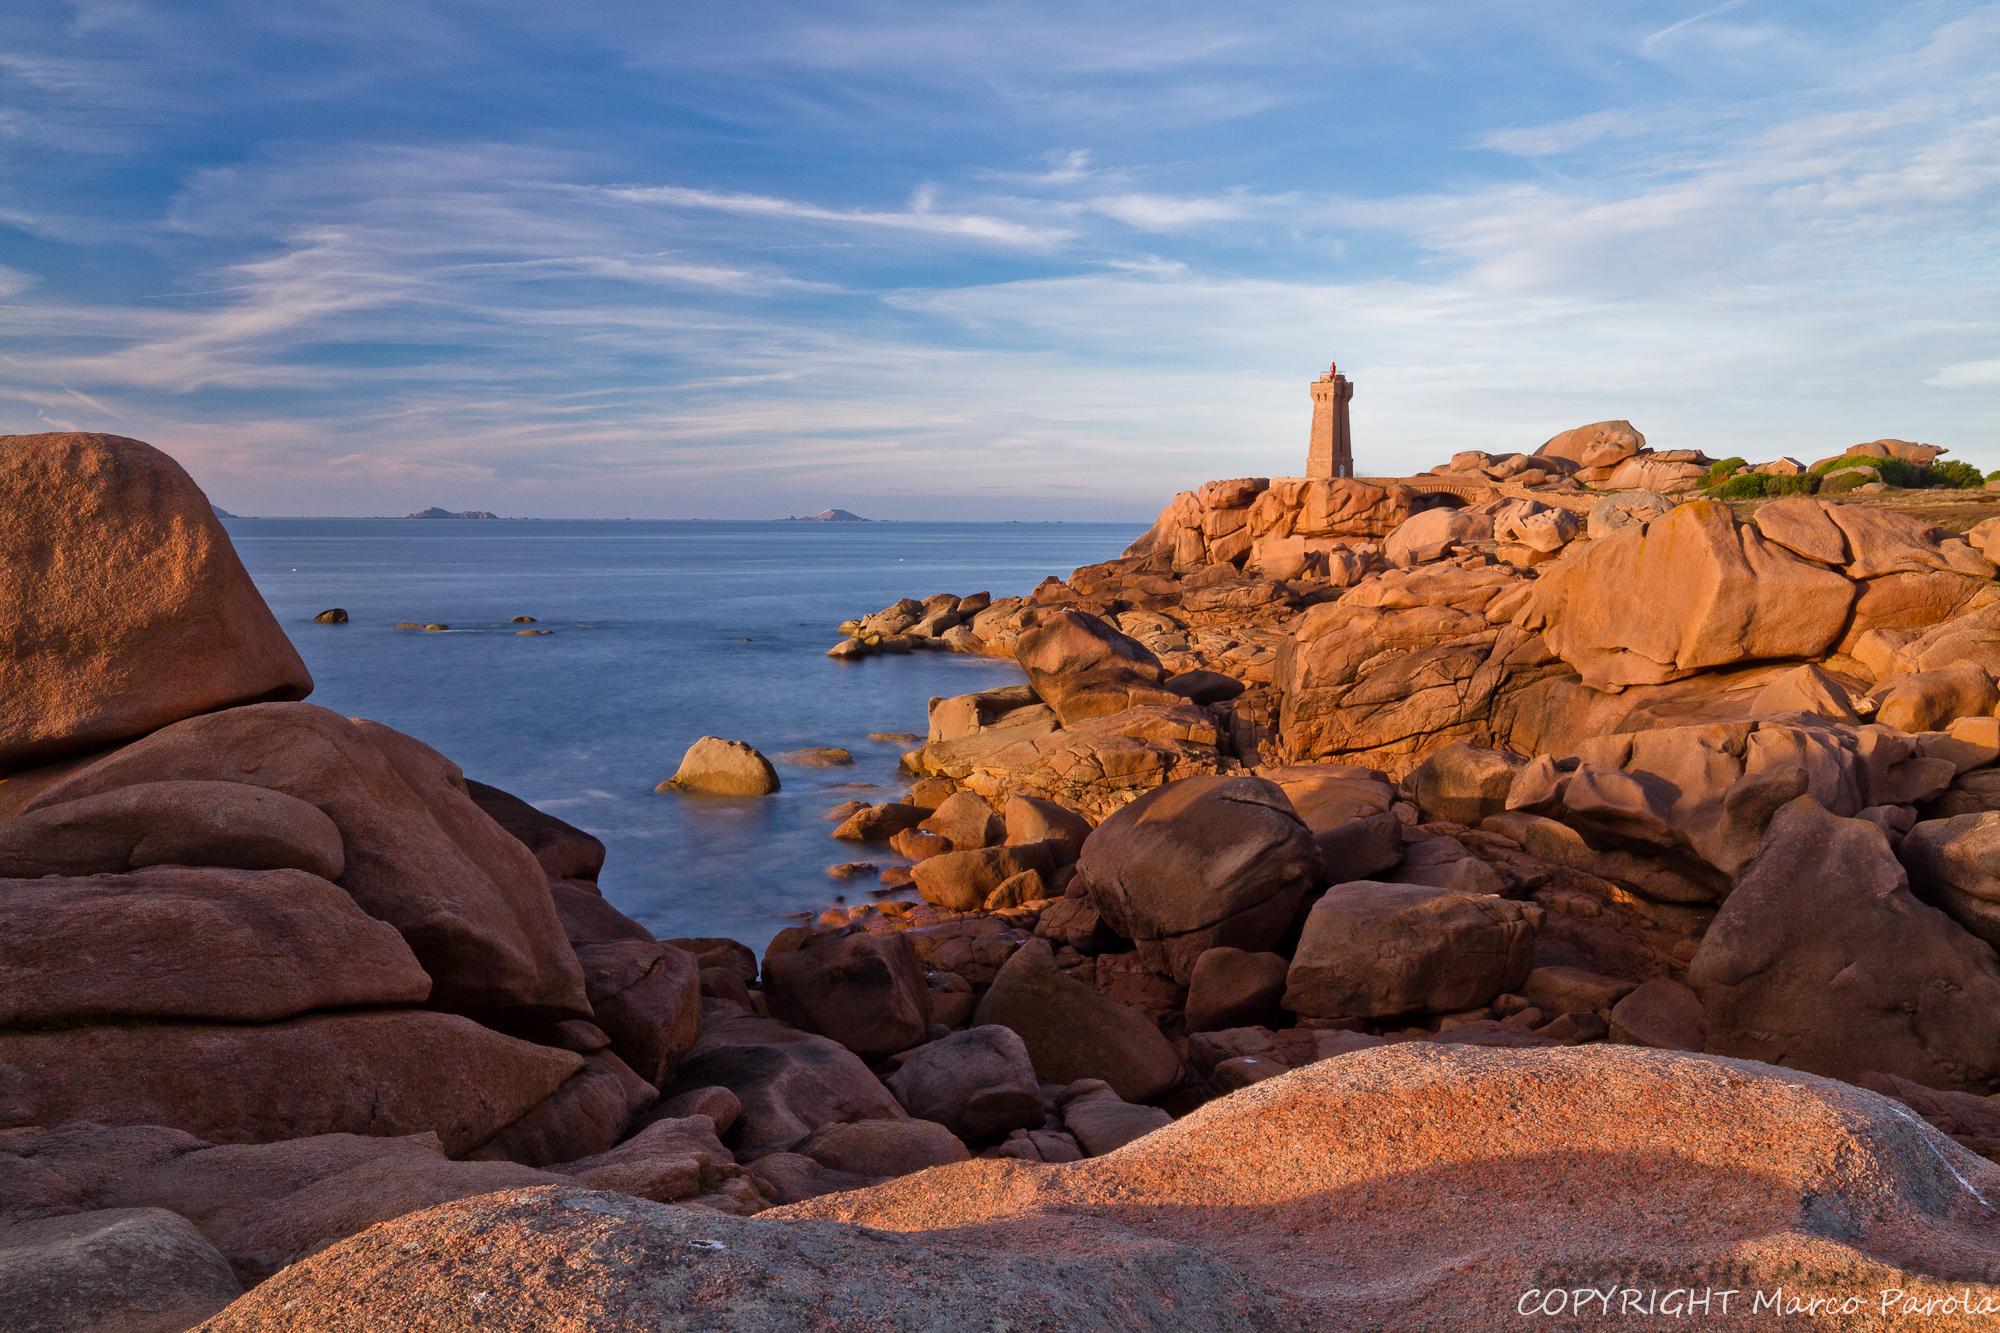 sunset at the lighthouse (ploumanac'h)...